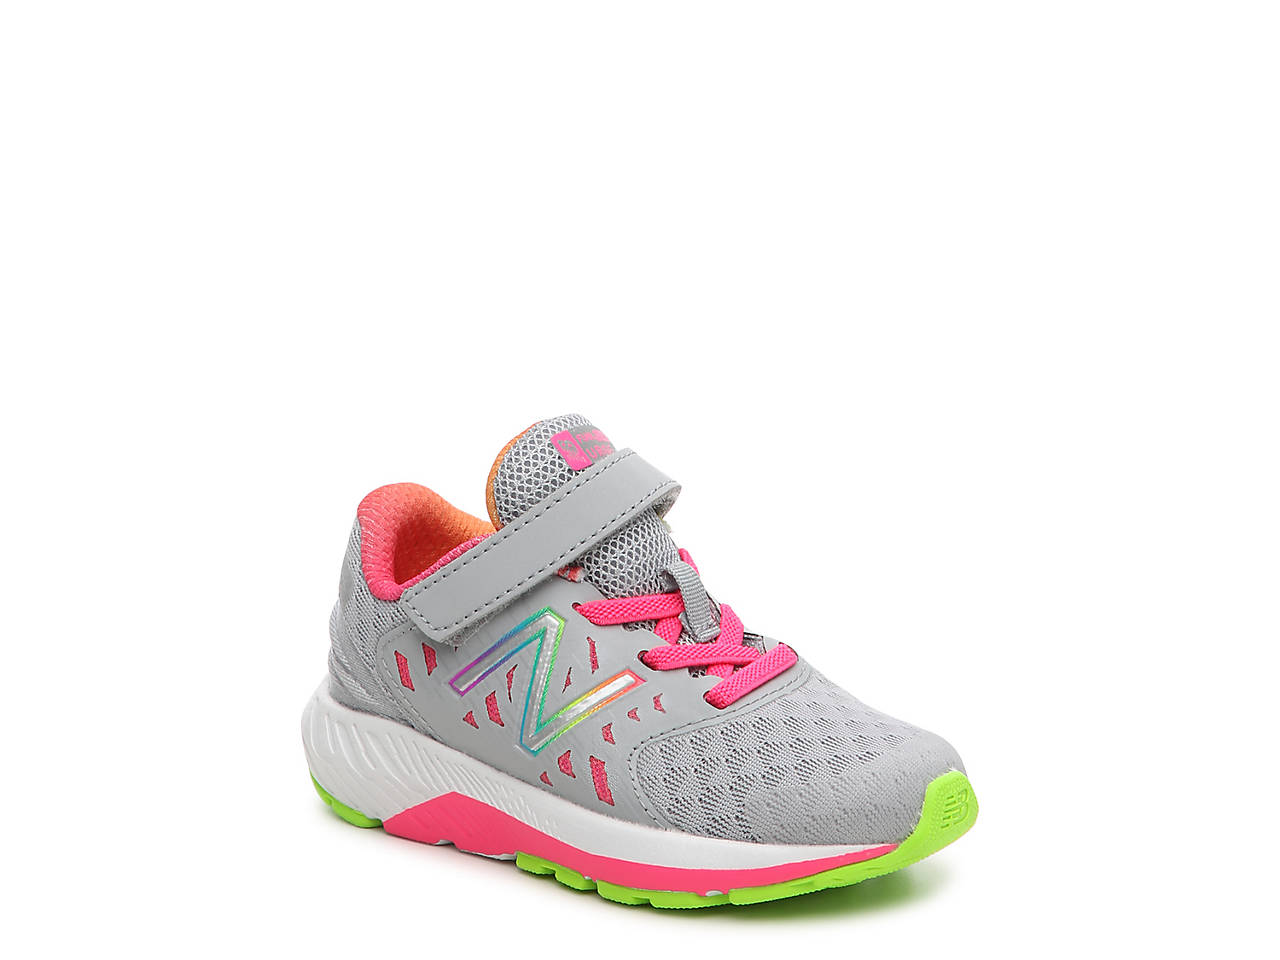 efb260730dcd4 New Balance Fuelcore Urge Sneaker - Kids' Kids Shoes   DSW